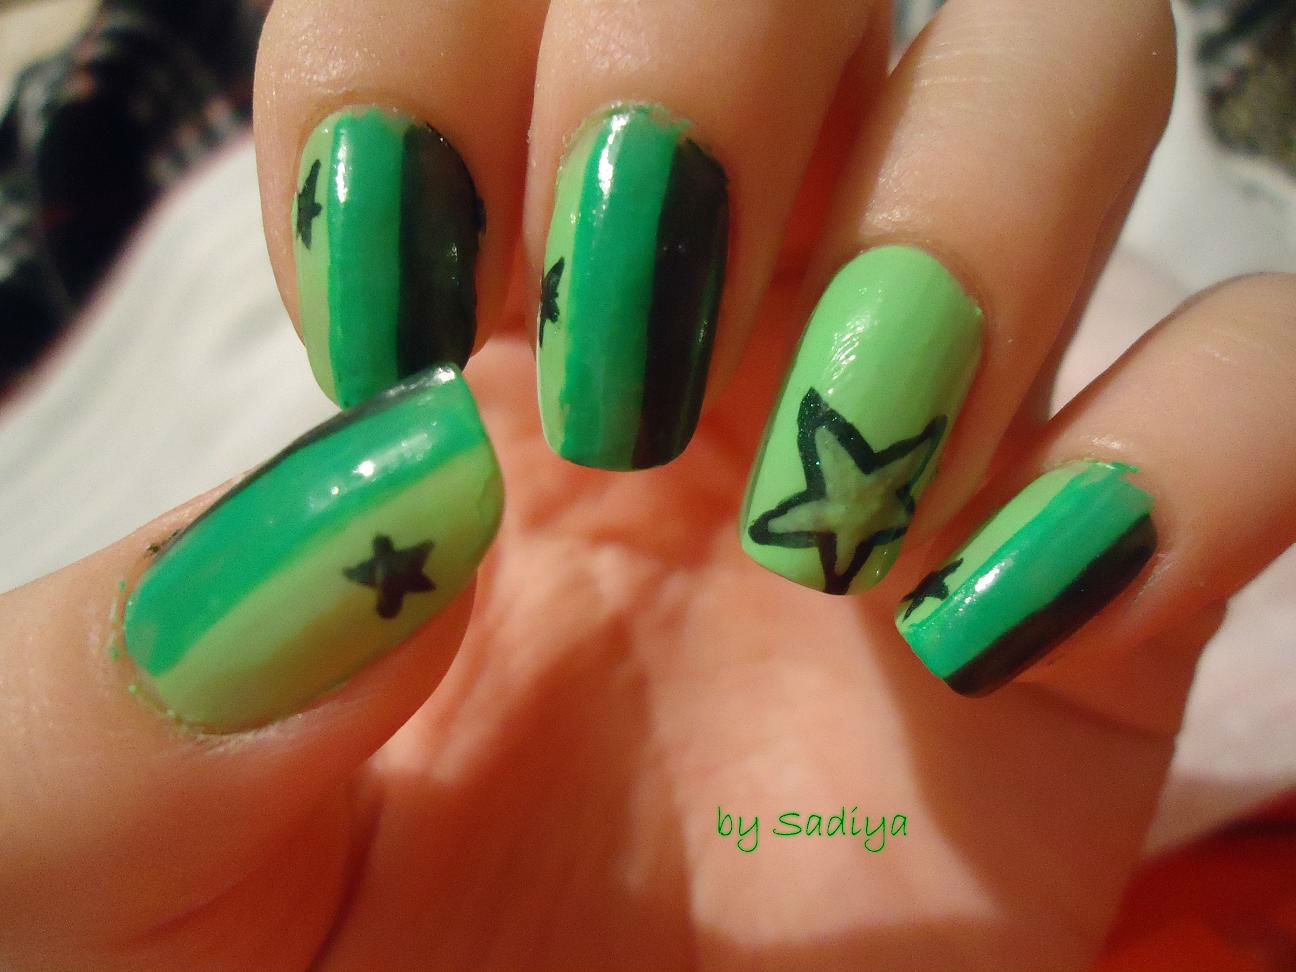 stars nails by Sadiya by SAYANEcw on DeviantArt